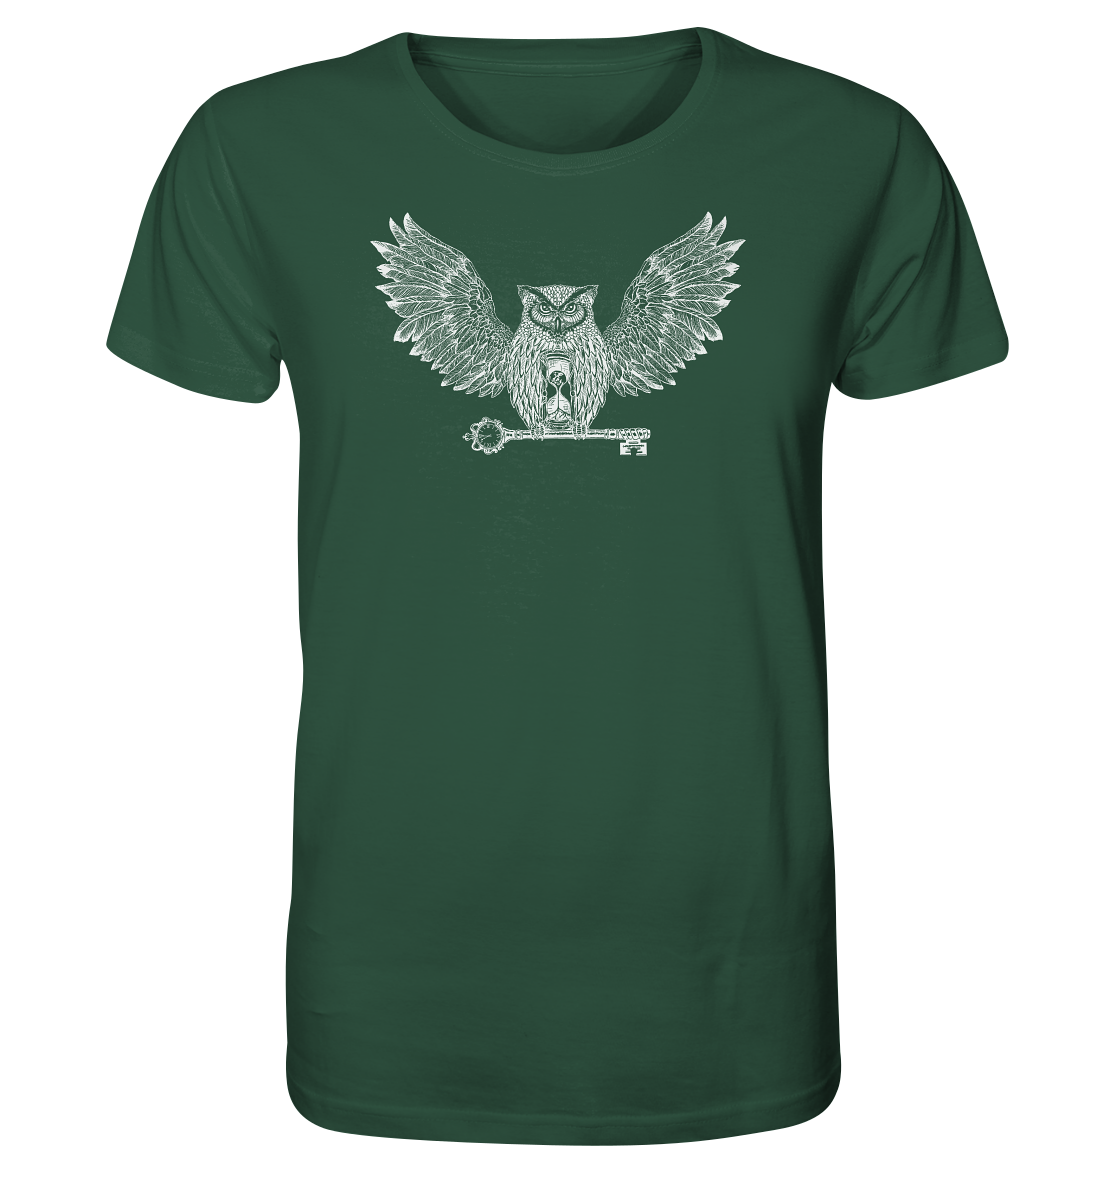 front-organic-shirt-2f5240-1116x-4.png